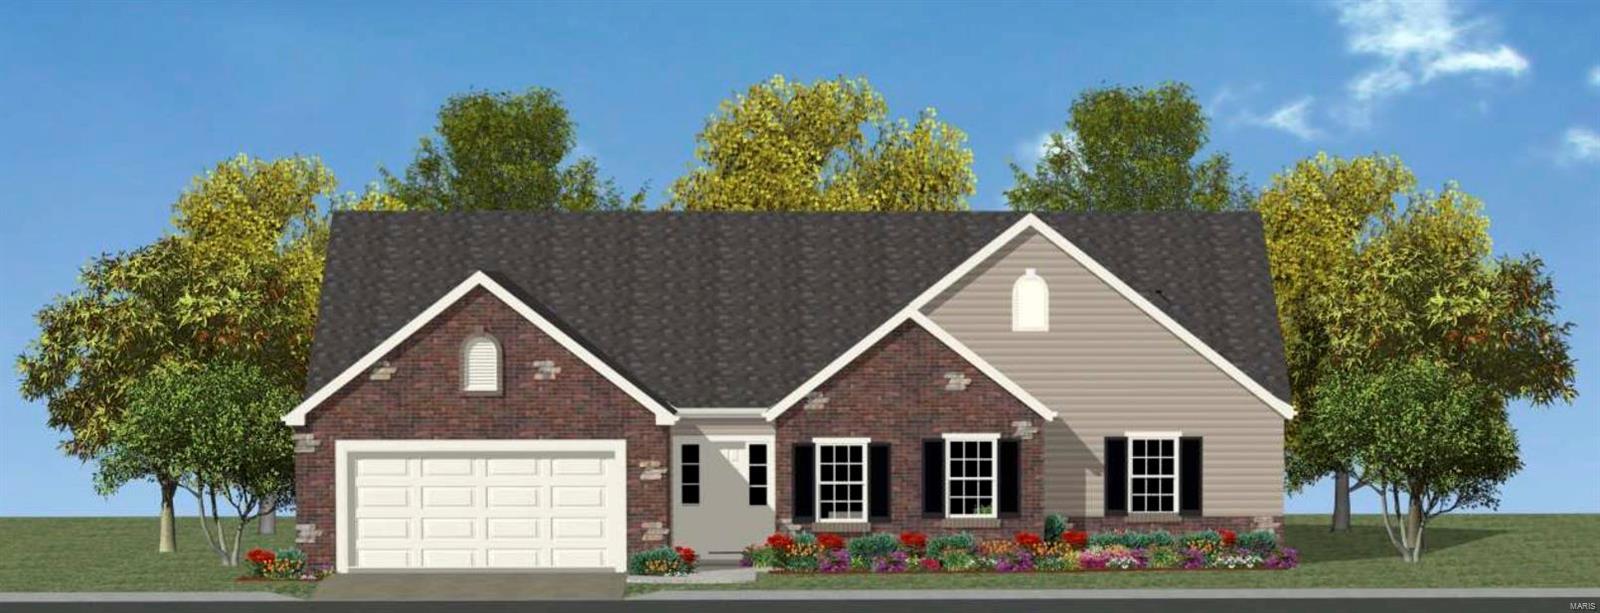 126 Timber Wolf Valley/DALHOUSIE Property Photo - Festus, MO real estate listing